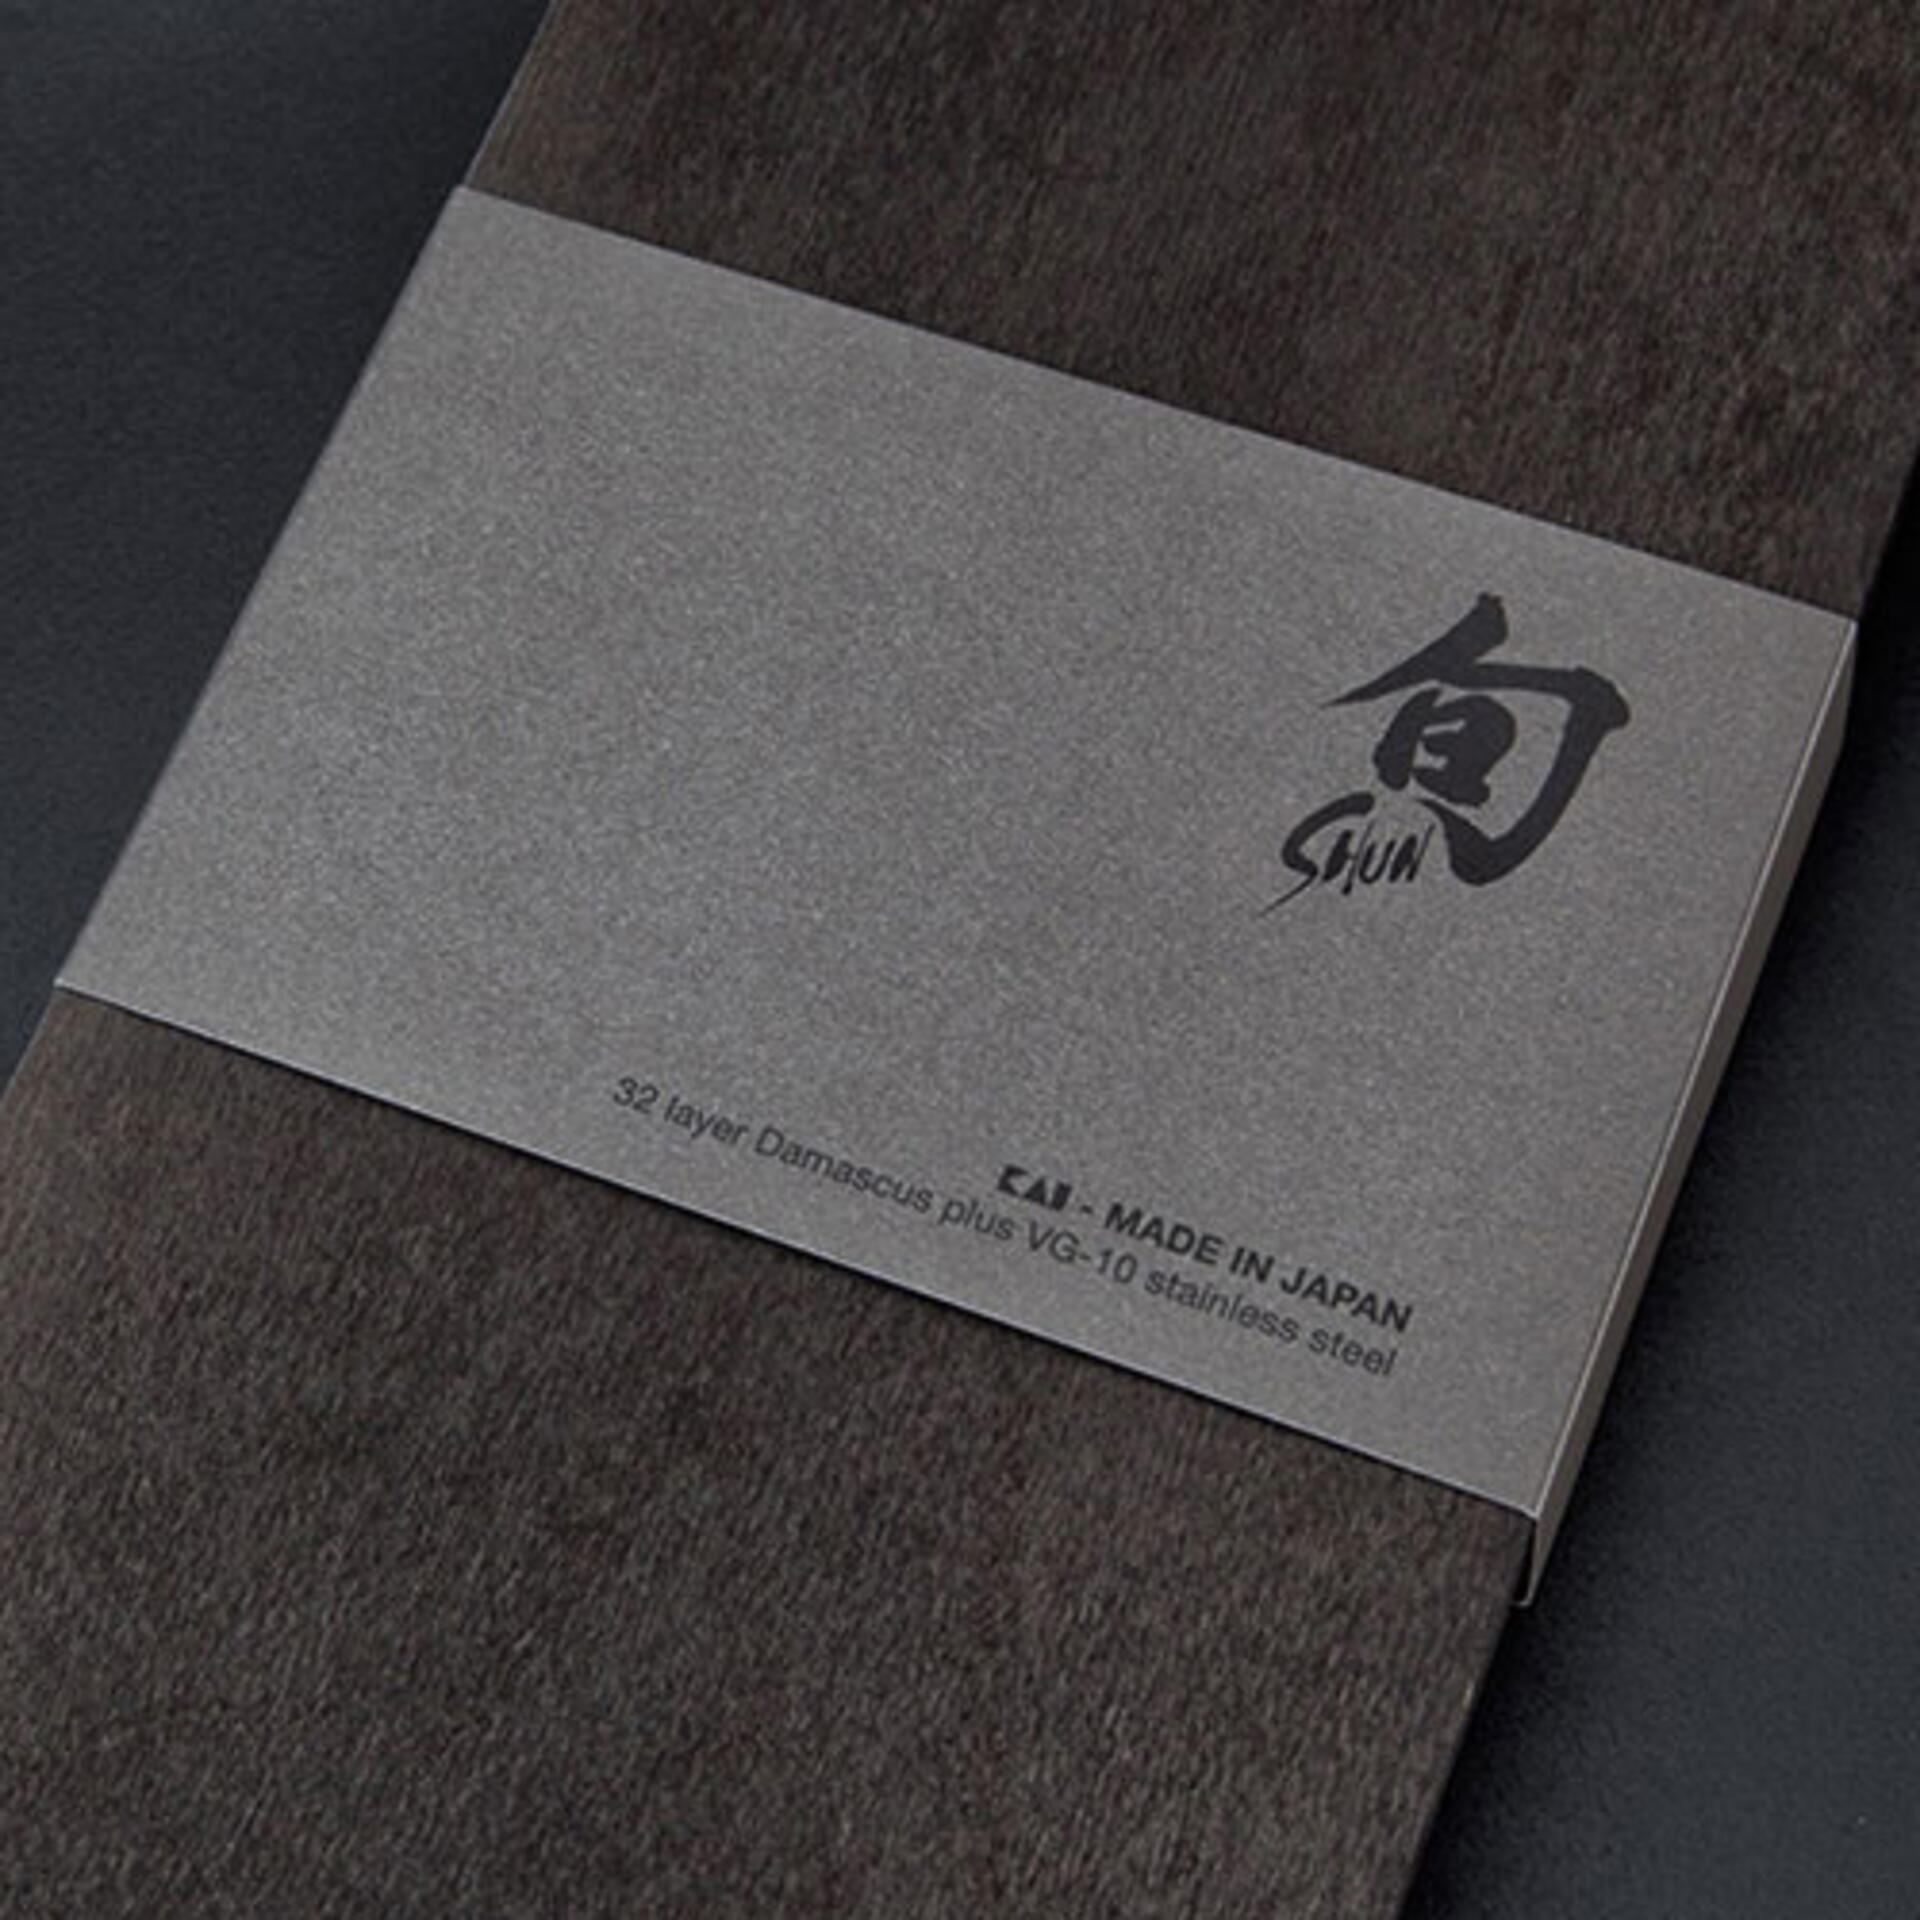 KAI Shun Classic Santoku DM-0702